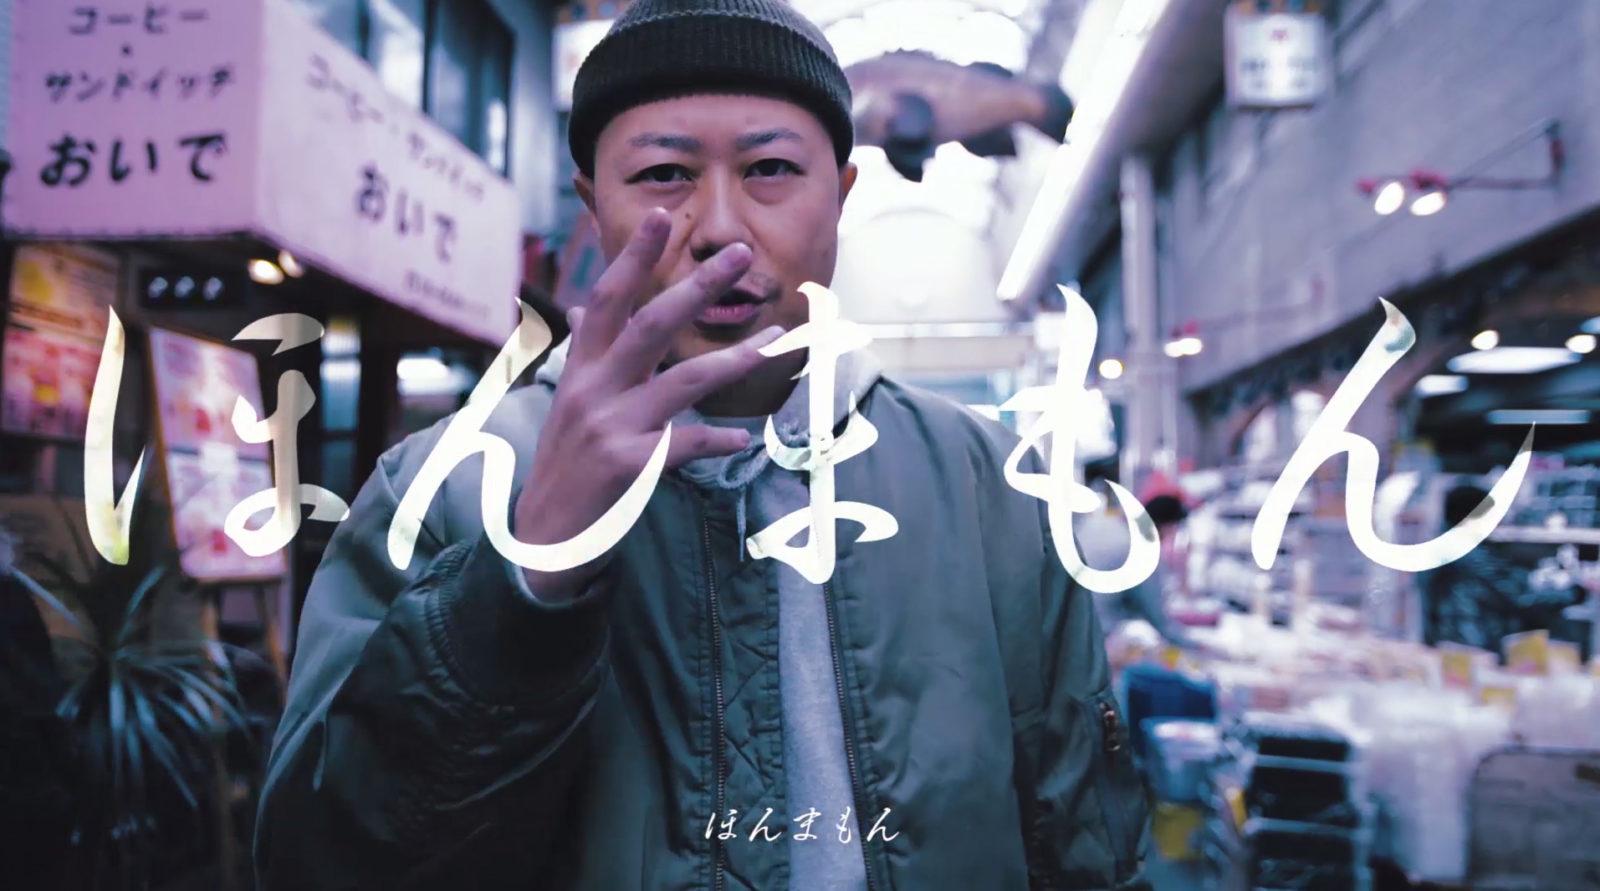 大阪黒門市場PRムービー /『BGM-BLACK GATE MARKET』